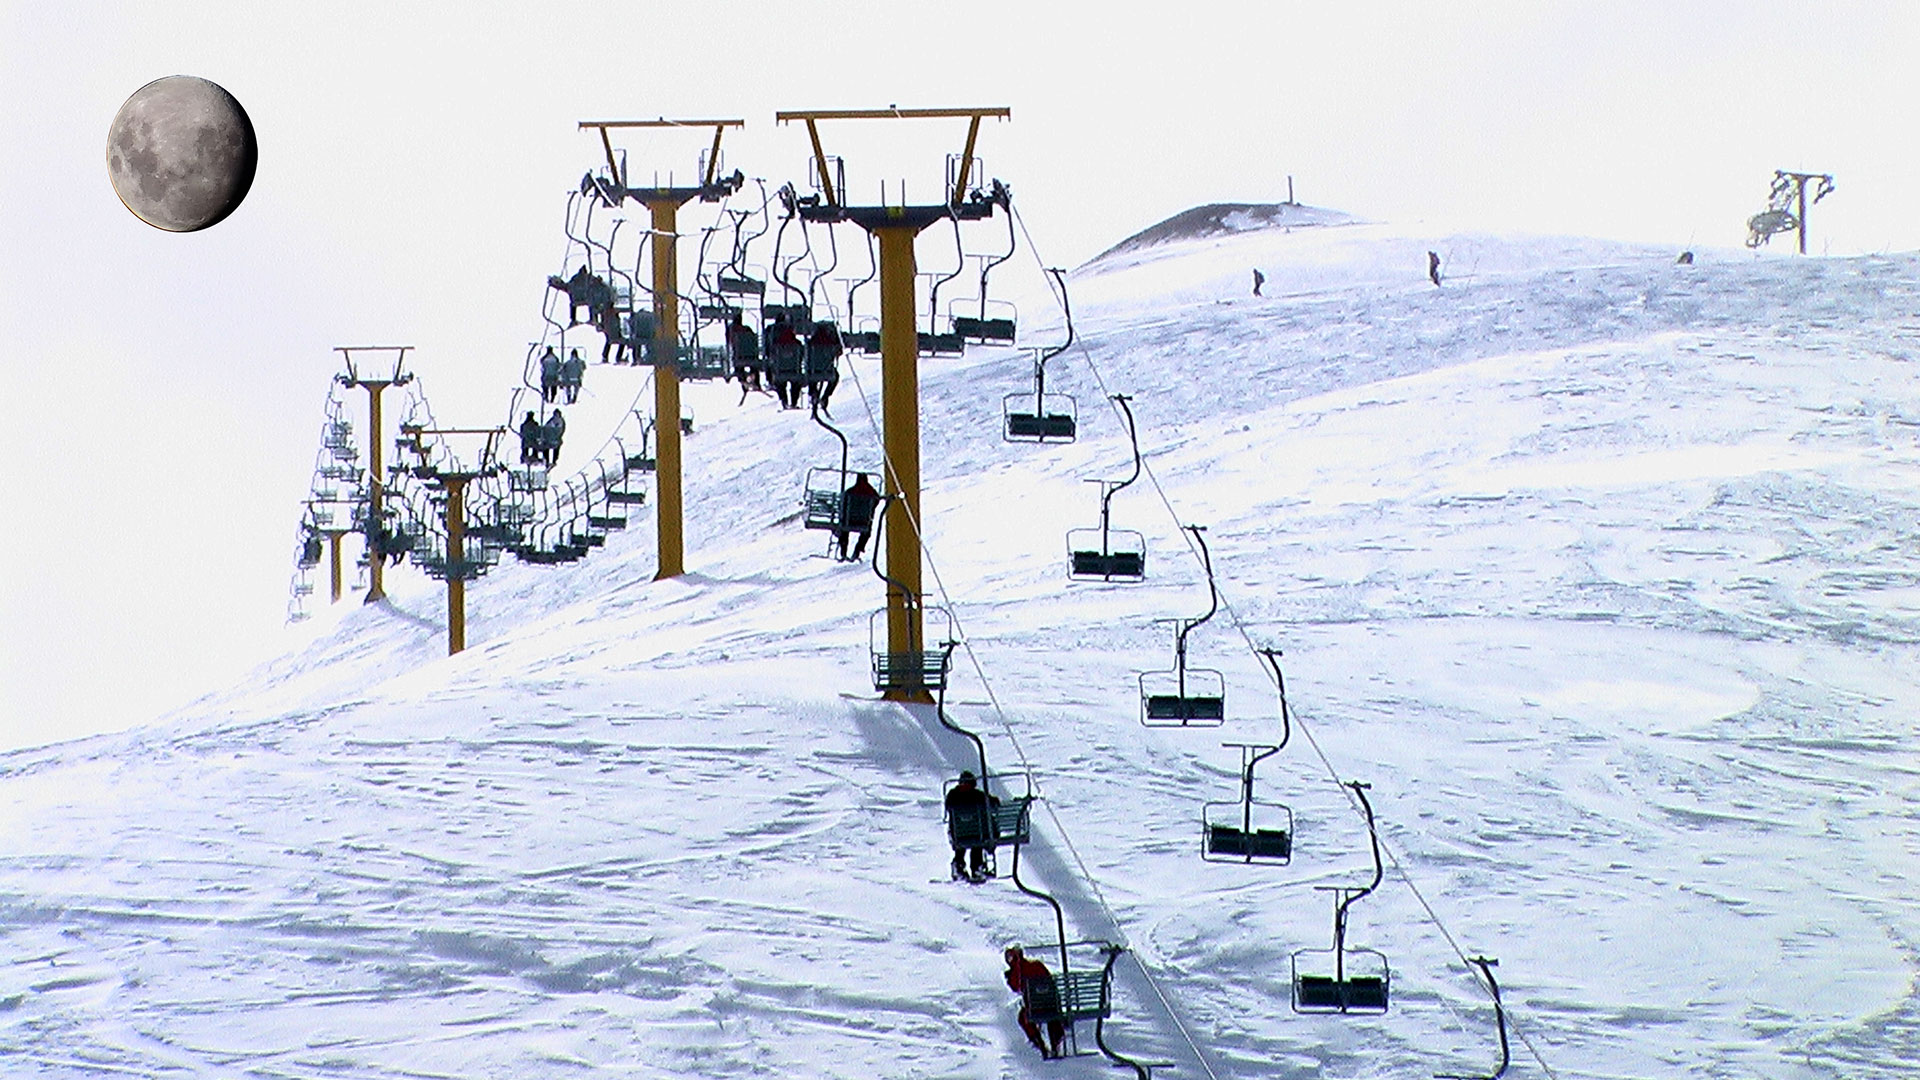 Penitentes Ski Resort - Argentina